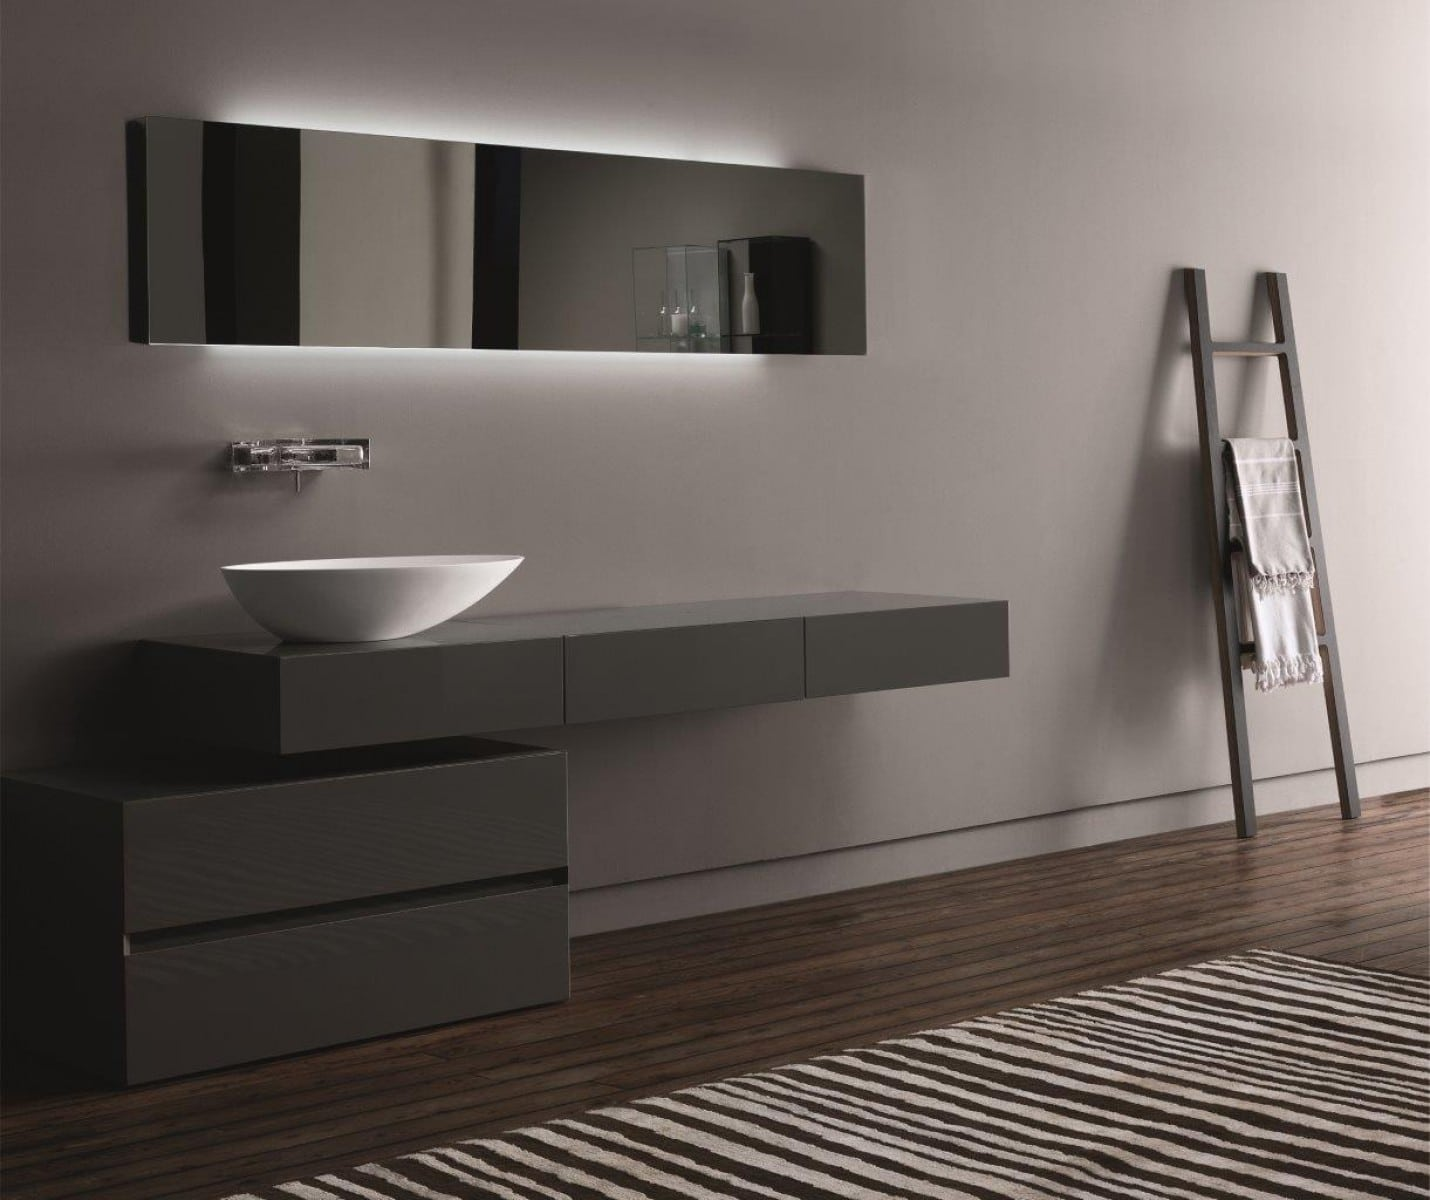 Dise o de cuartos de ba o modernos fotos construye hogar for Banos super modernos